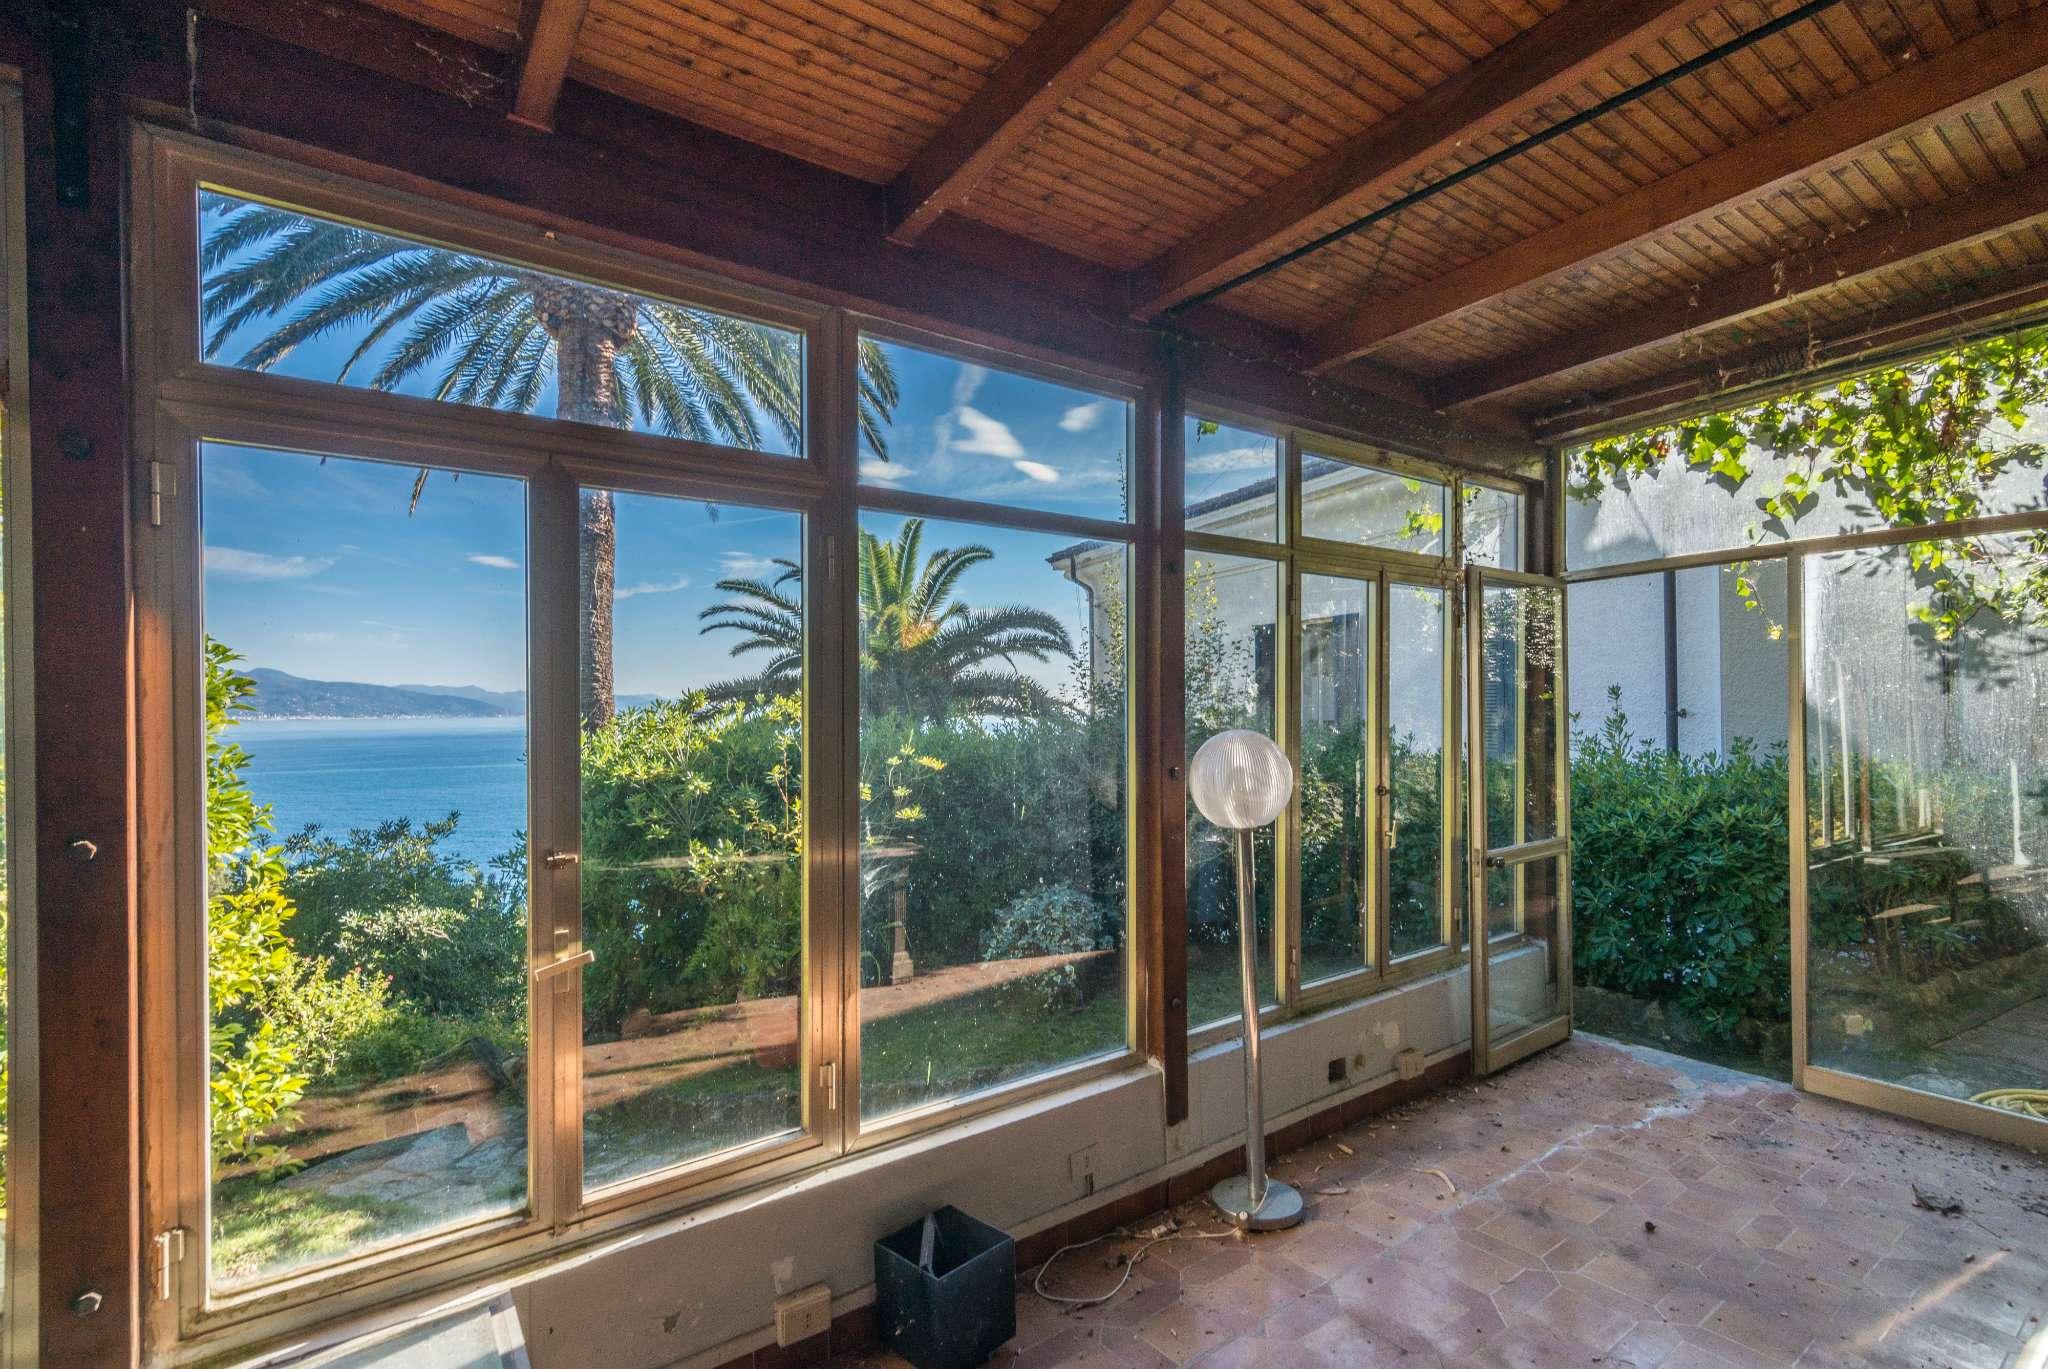 Villa in Vendita a Santa Margherita Ligure: 5 locali, 545 mq - Foto 12